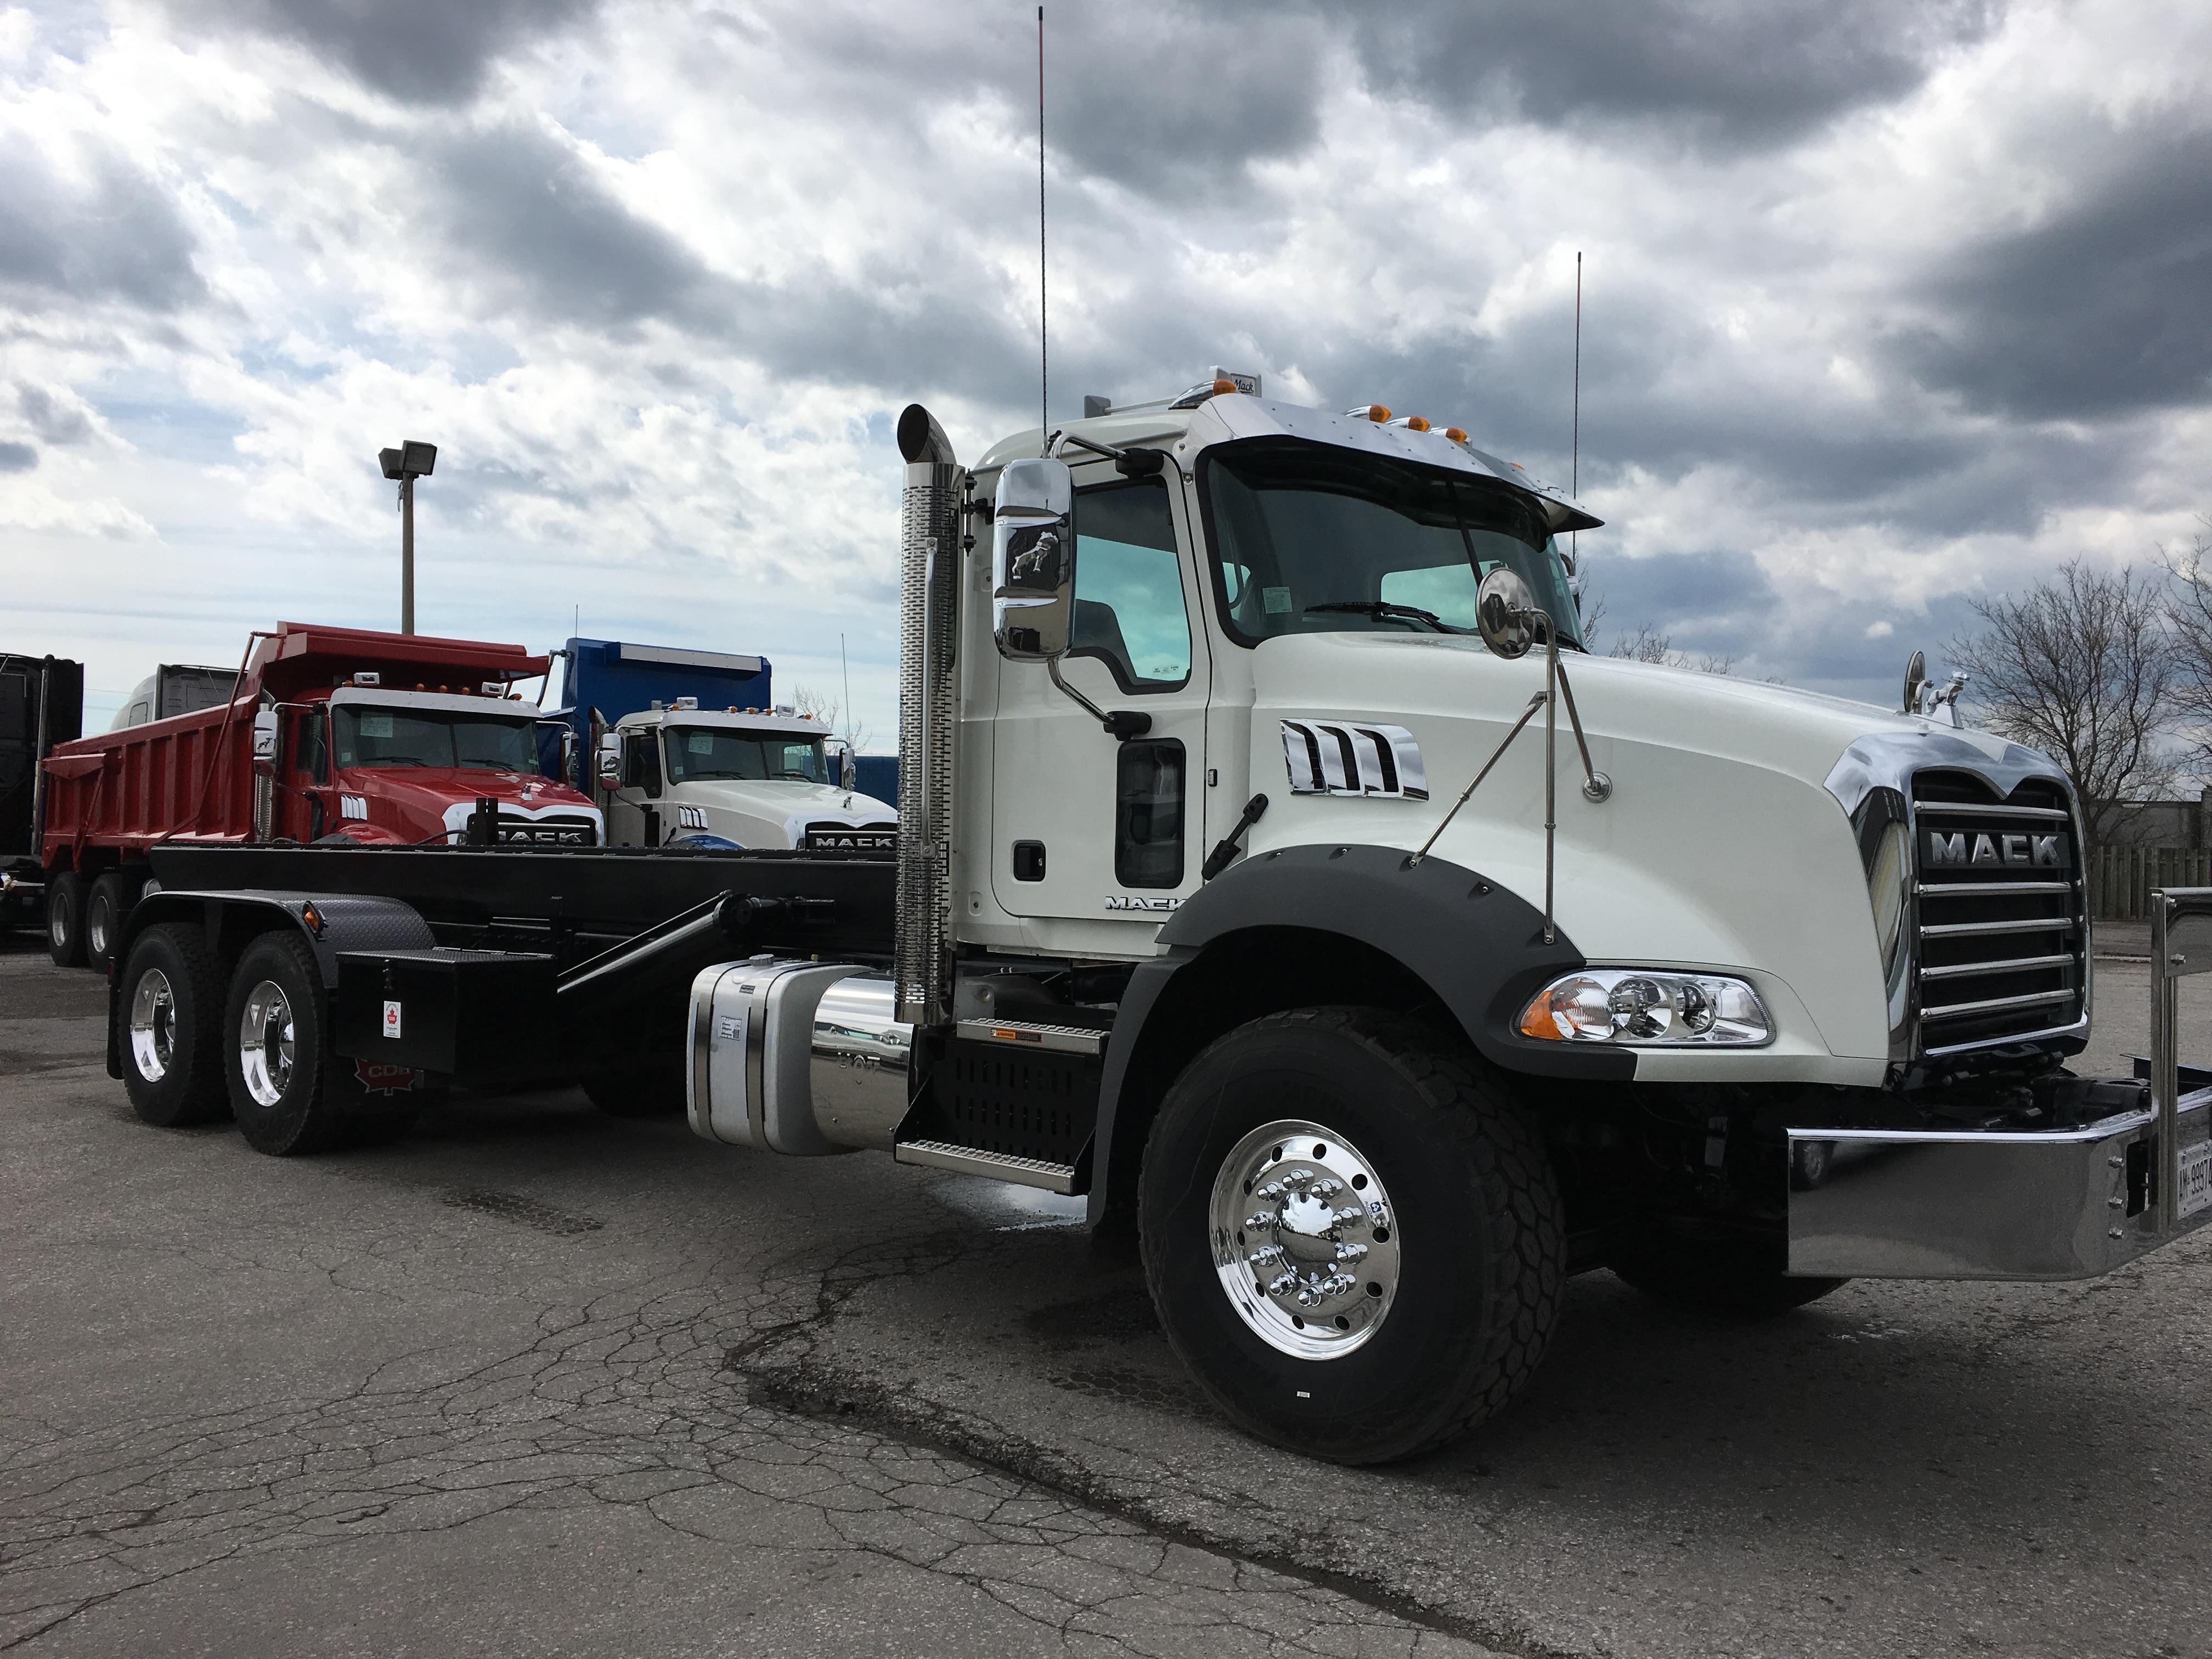 Mack Trucks | DURHAM TRUCK & EQUIPMENT SALES & SERVICE